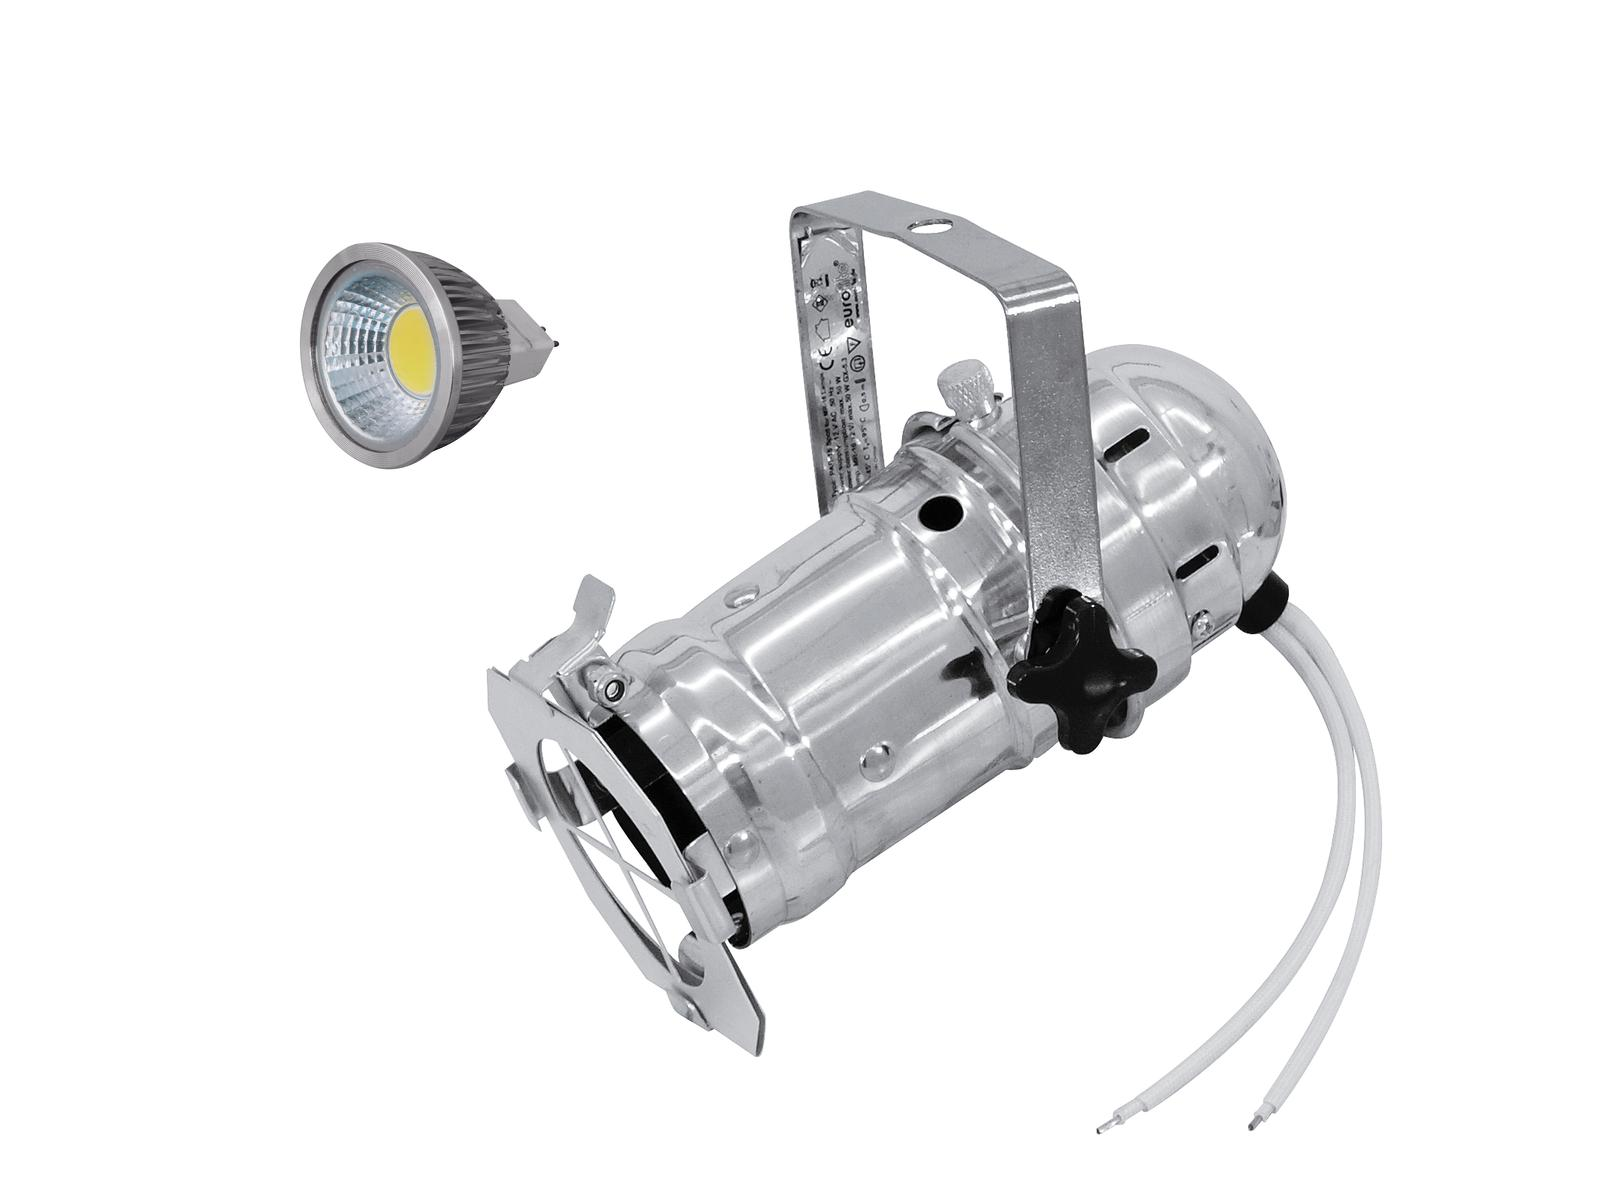 EUROLITE Impostare PAR-16 Spot sil + MR-16 12V GX-5,3 5W COB LED 6400K